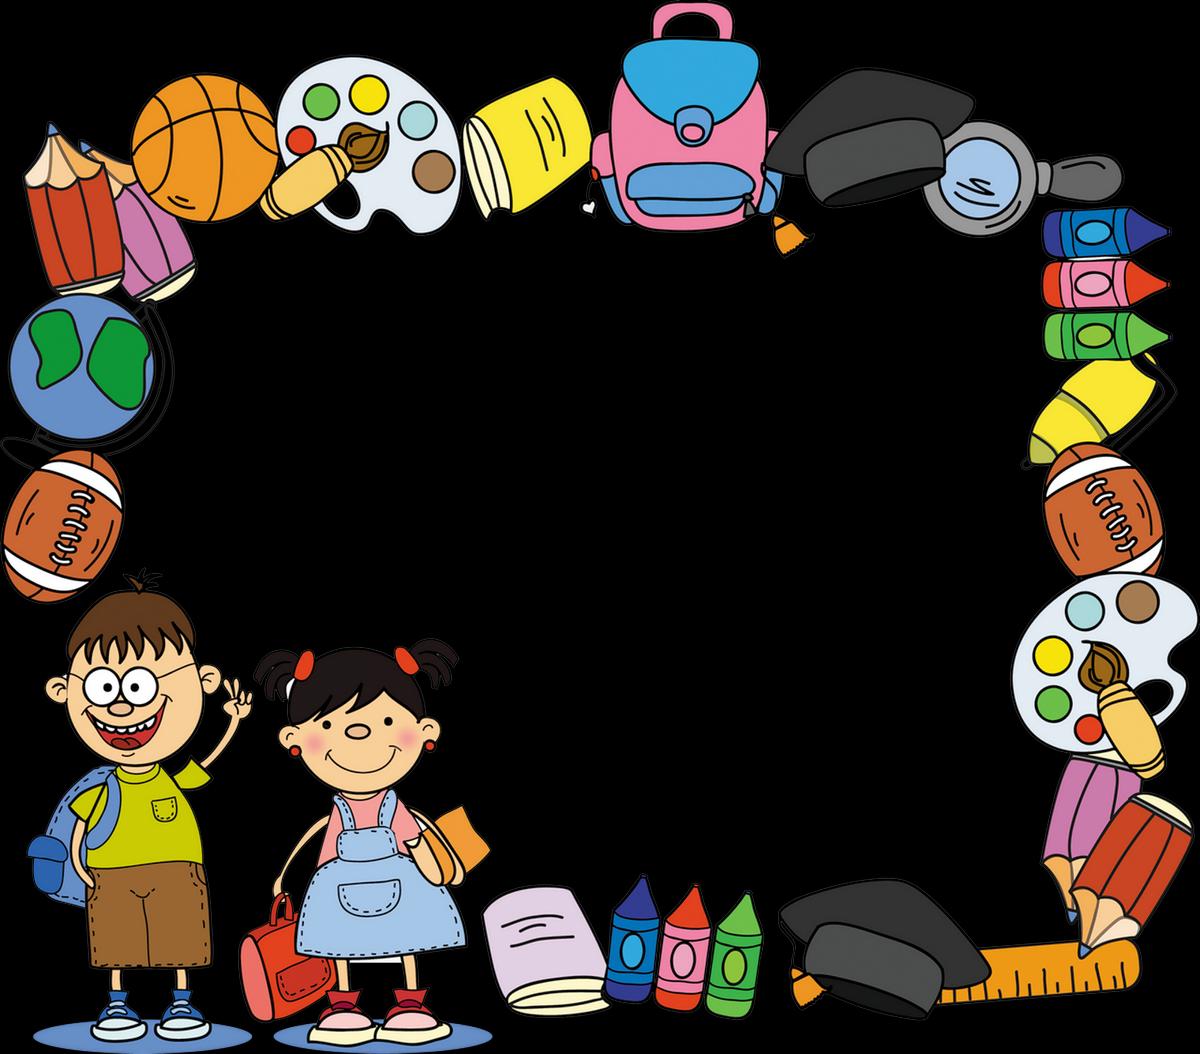 imagenes de niños graduados preescolar - Pesquisa do Google | Etiket ...